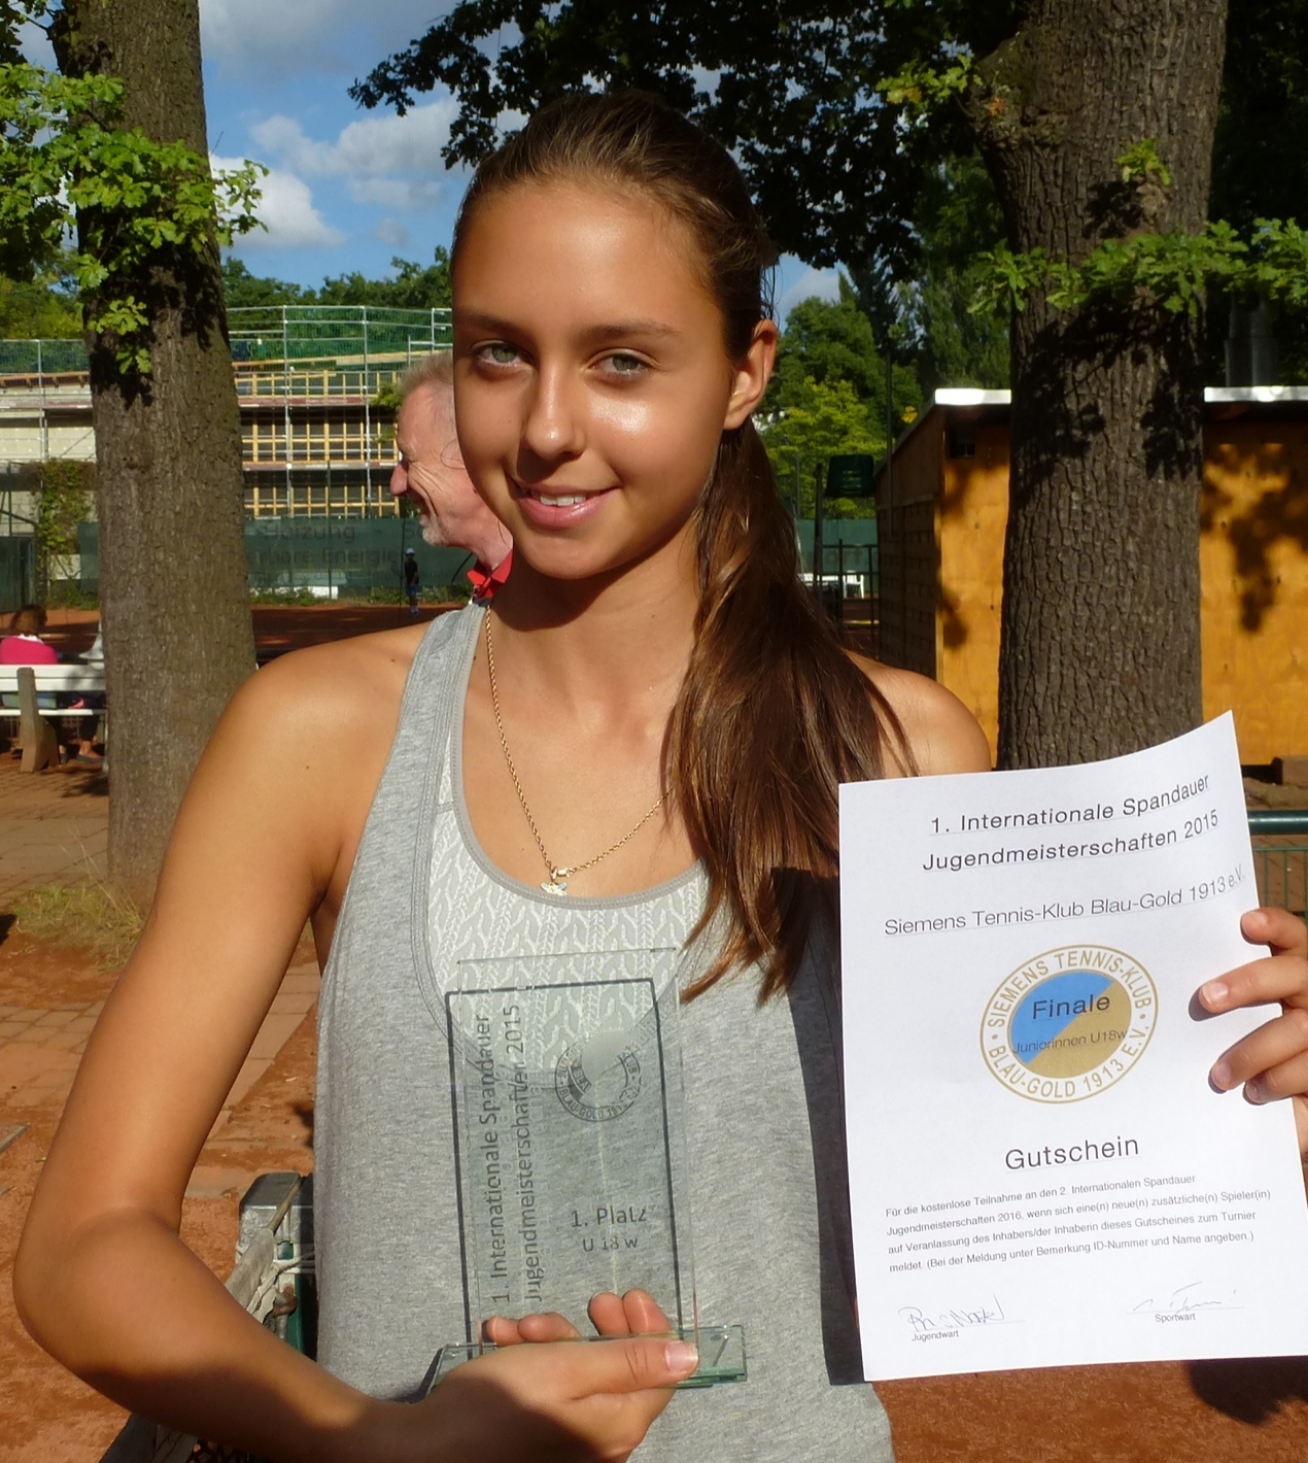 Marfa Kiseleva 1. Platz U18w 2015